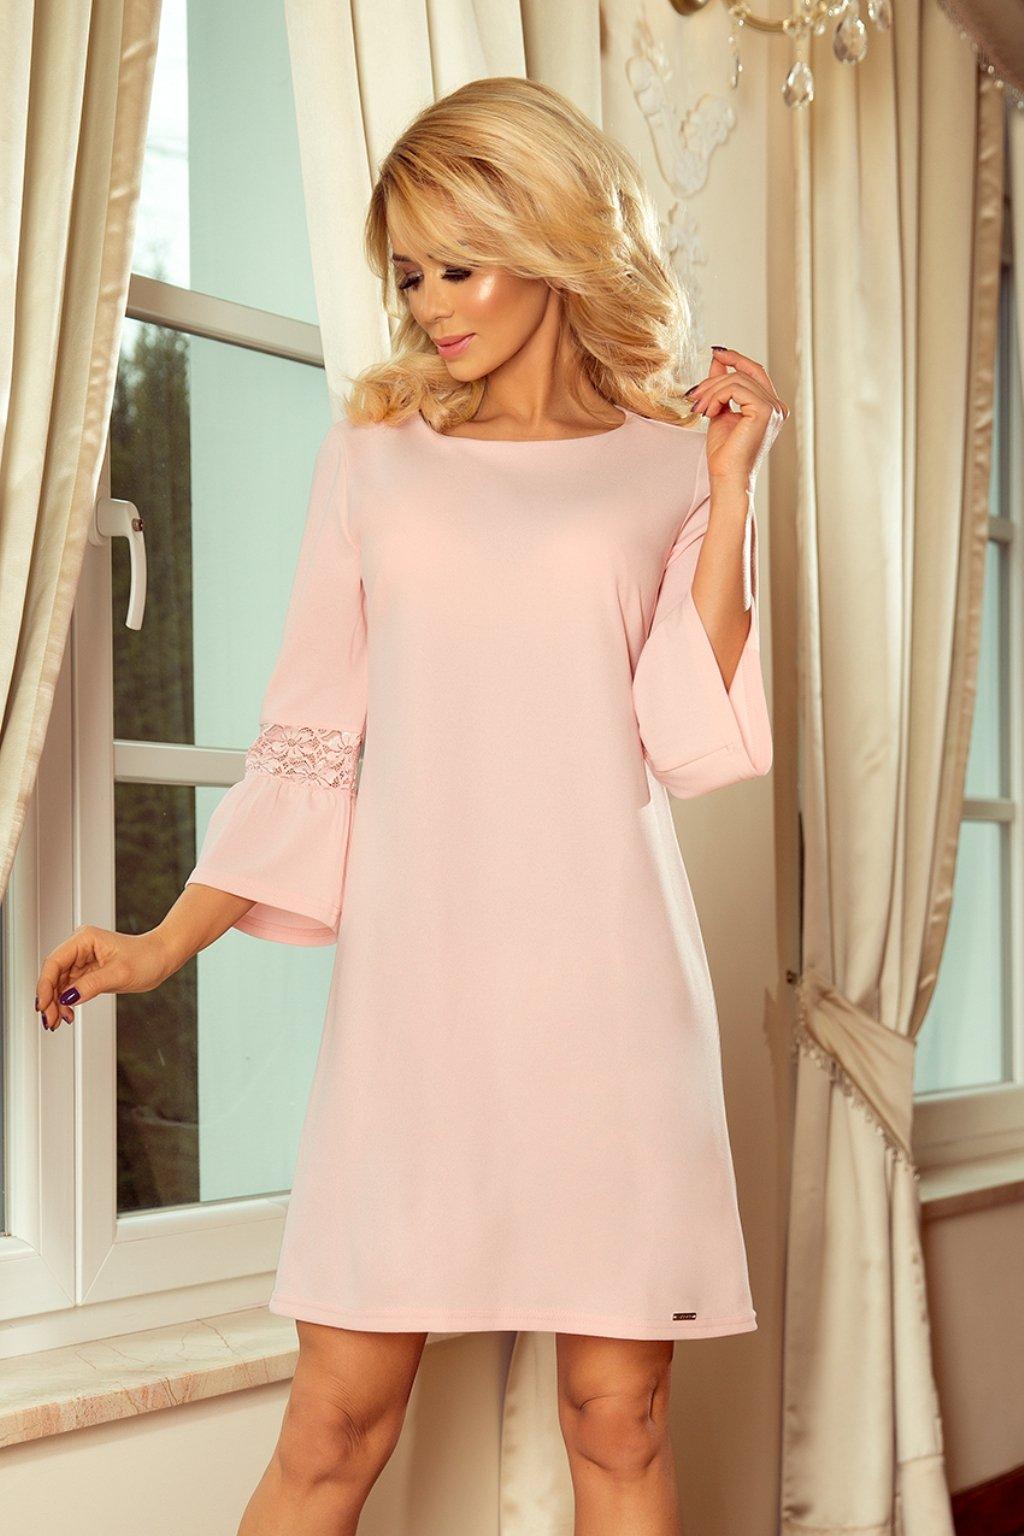 Ružové krátke šaty s jemnou krajkou